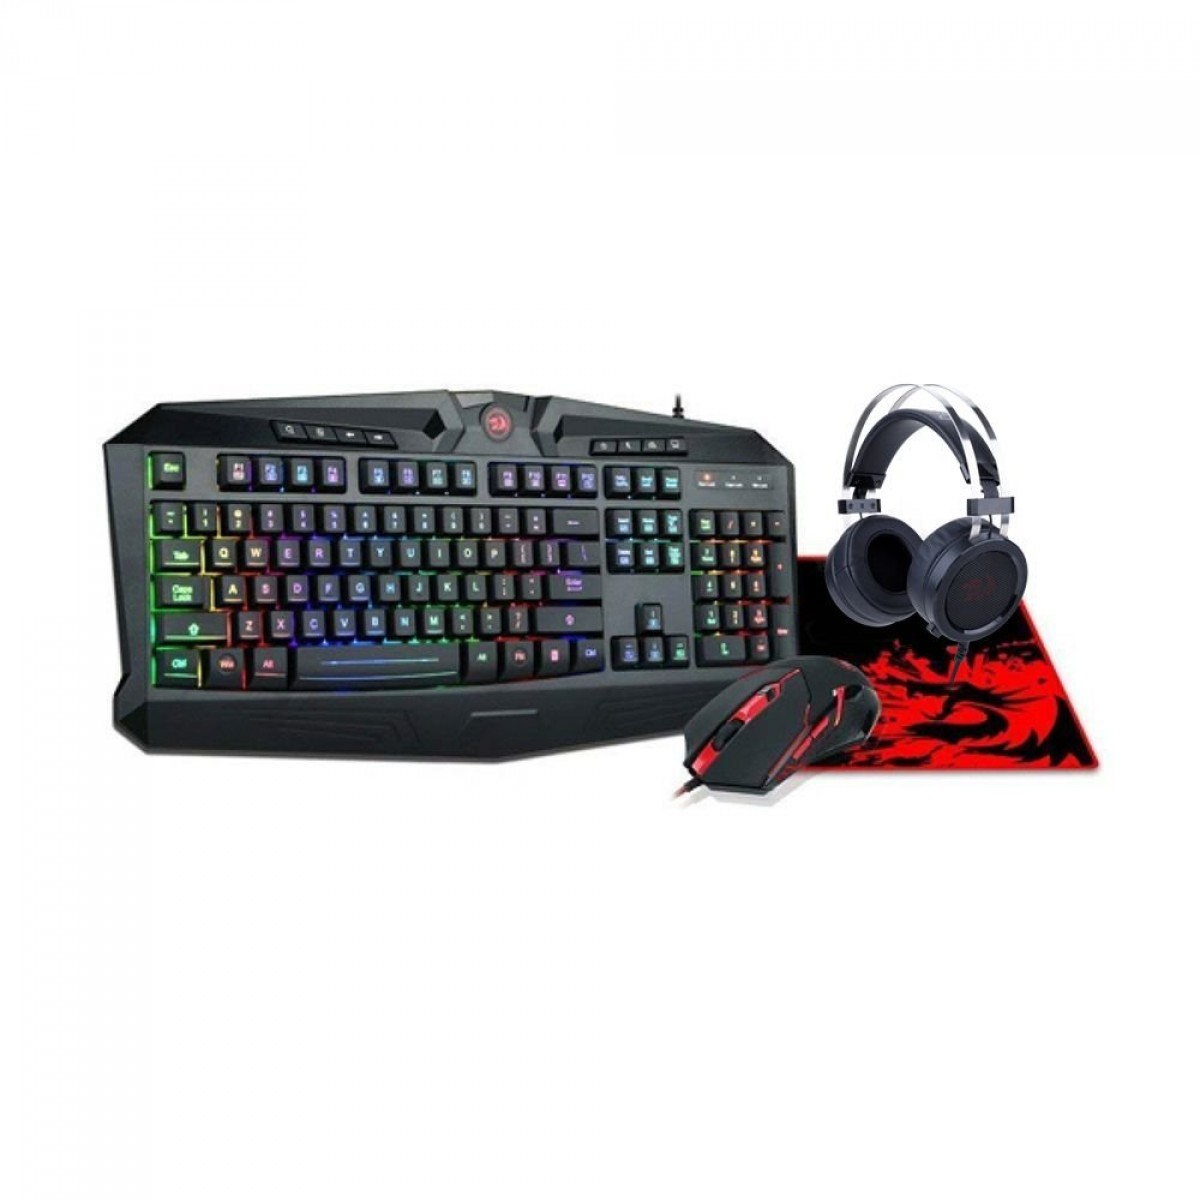 Combo Gamer S112: Teclado, Mouse. Headset e Mousepad - Redragon